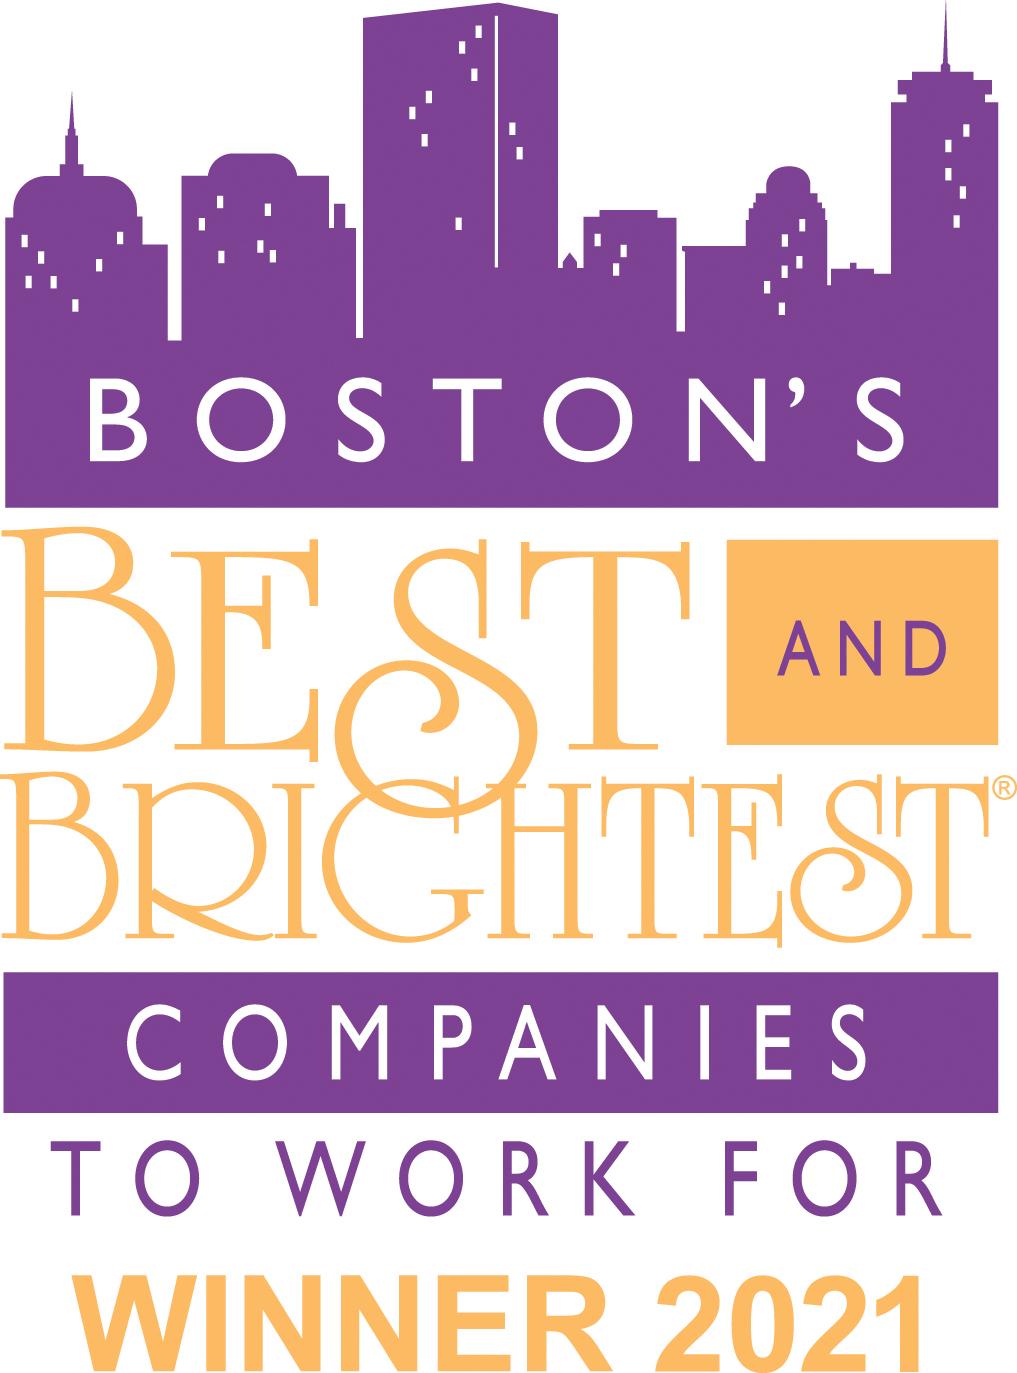 BostonBBlogoWin21_RGB